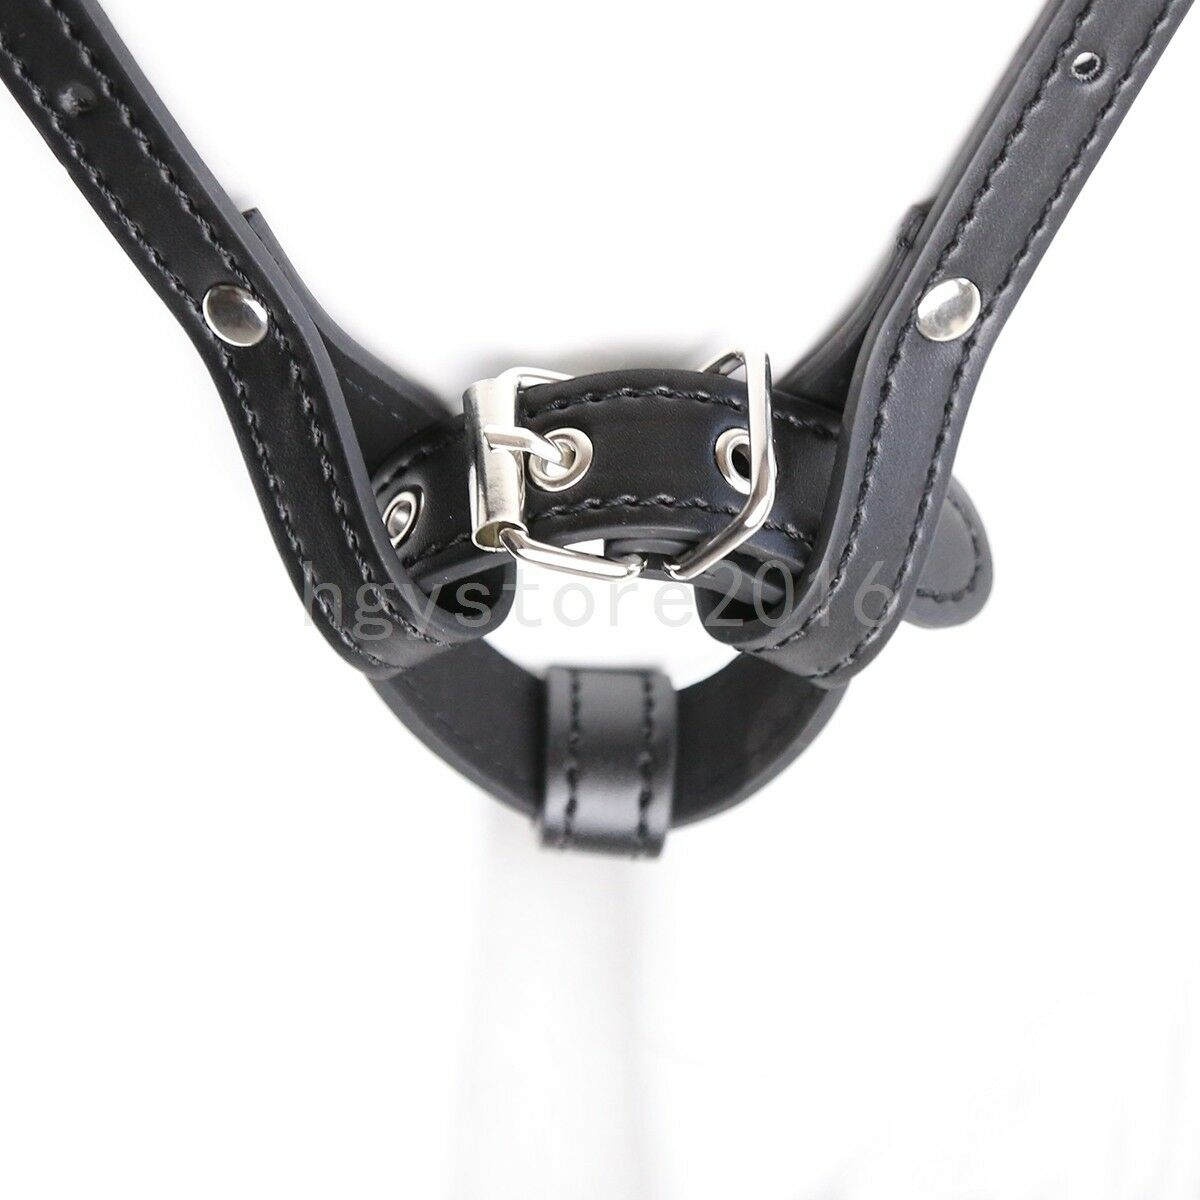 Magic Wand Massager Holder Strap on Harness Panties Thong PU-Leather Restraint